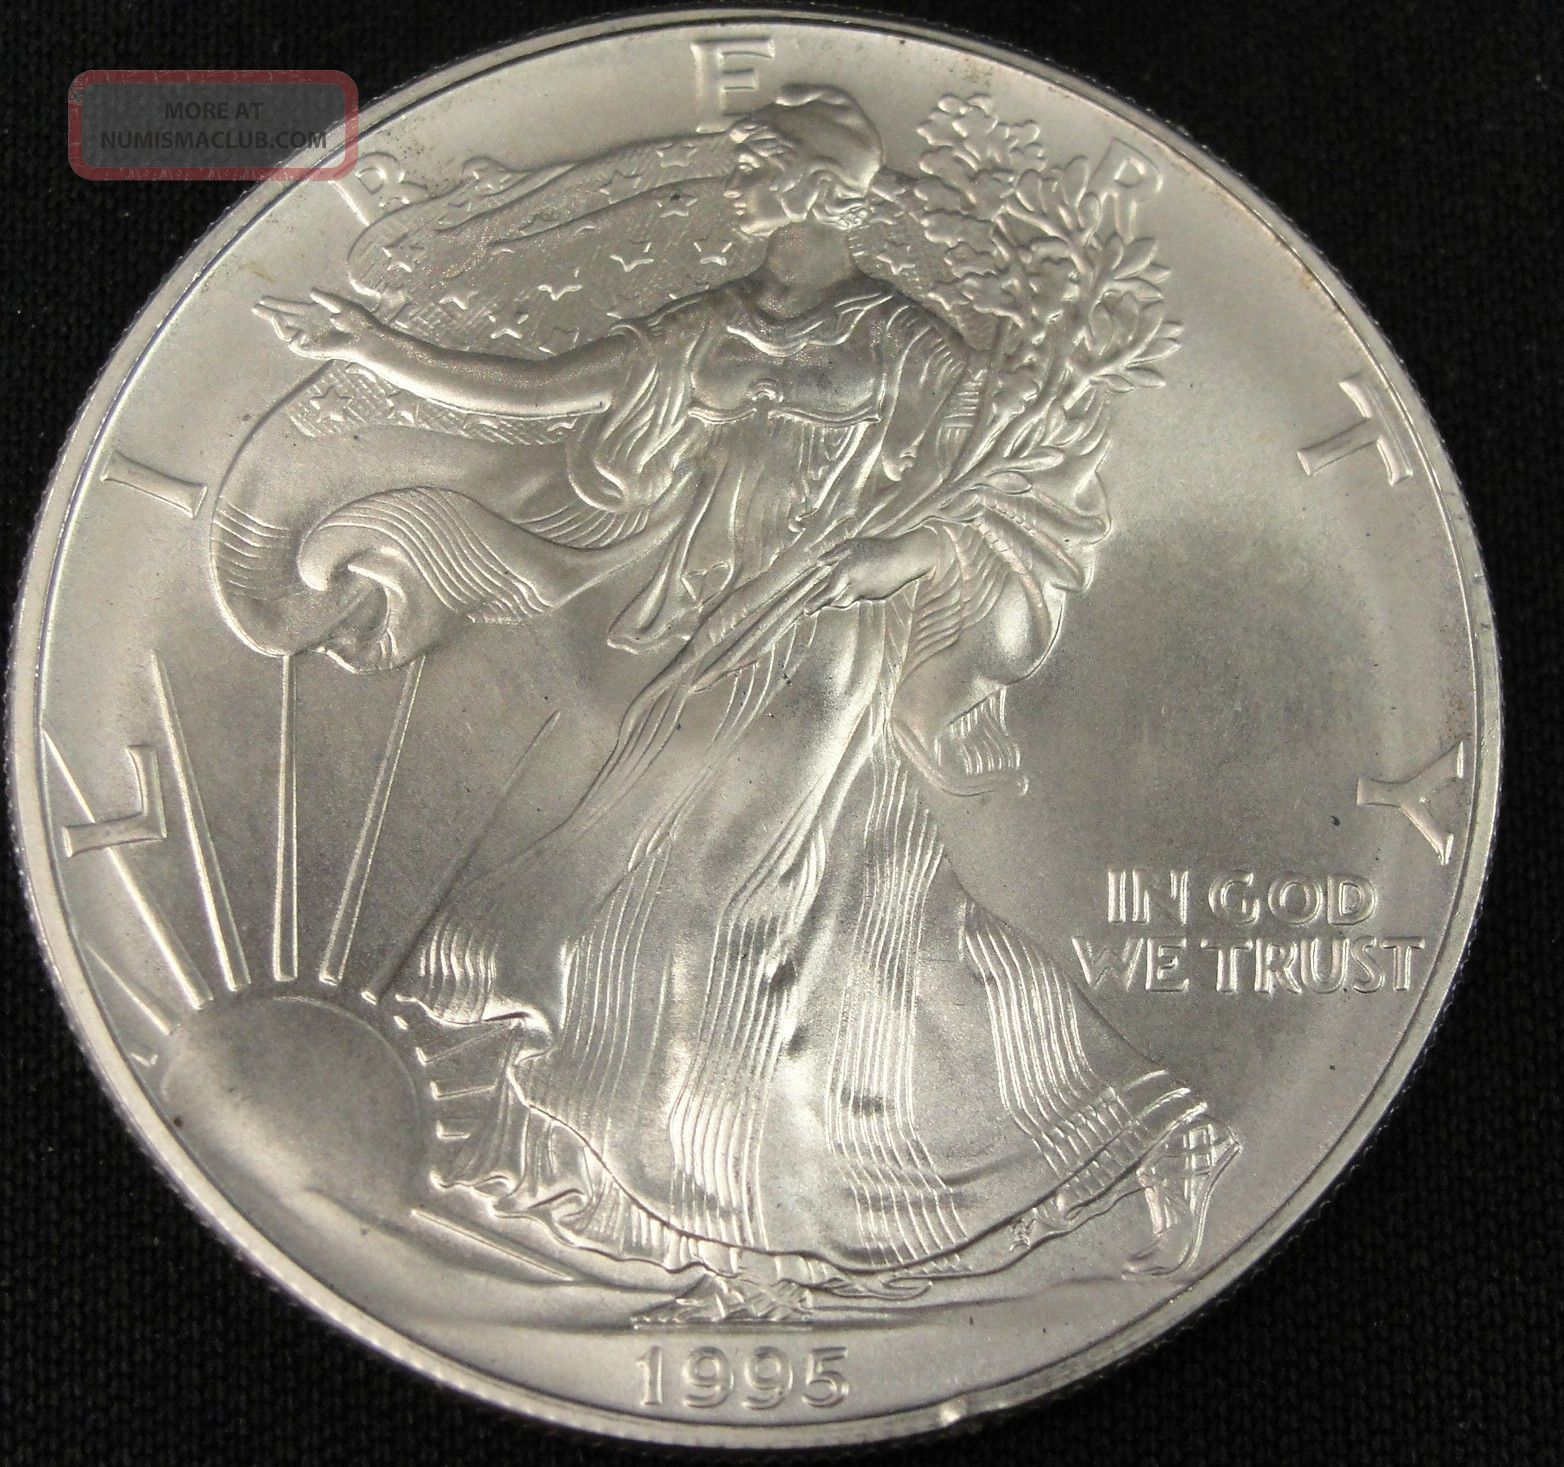 1995 American Silver Eagle Bullion Coin Key Date Uncirculated Nr Silver photo